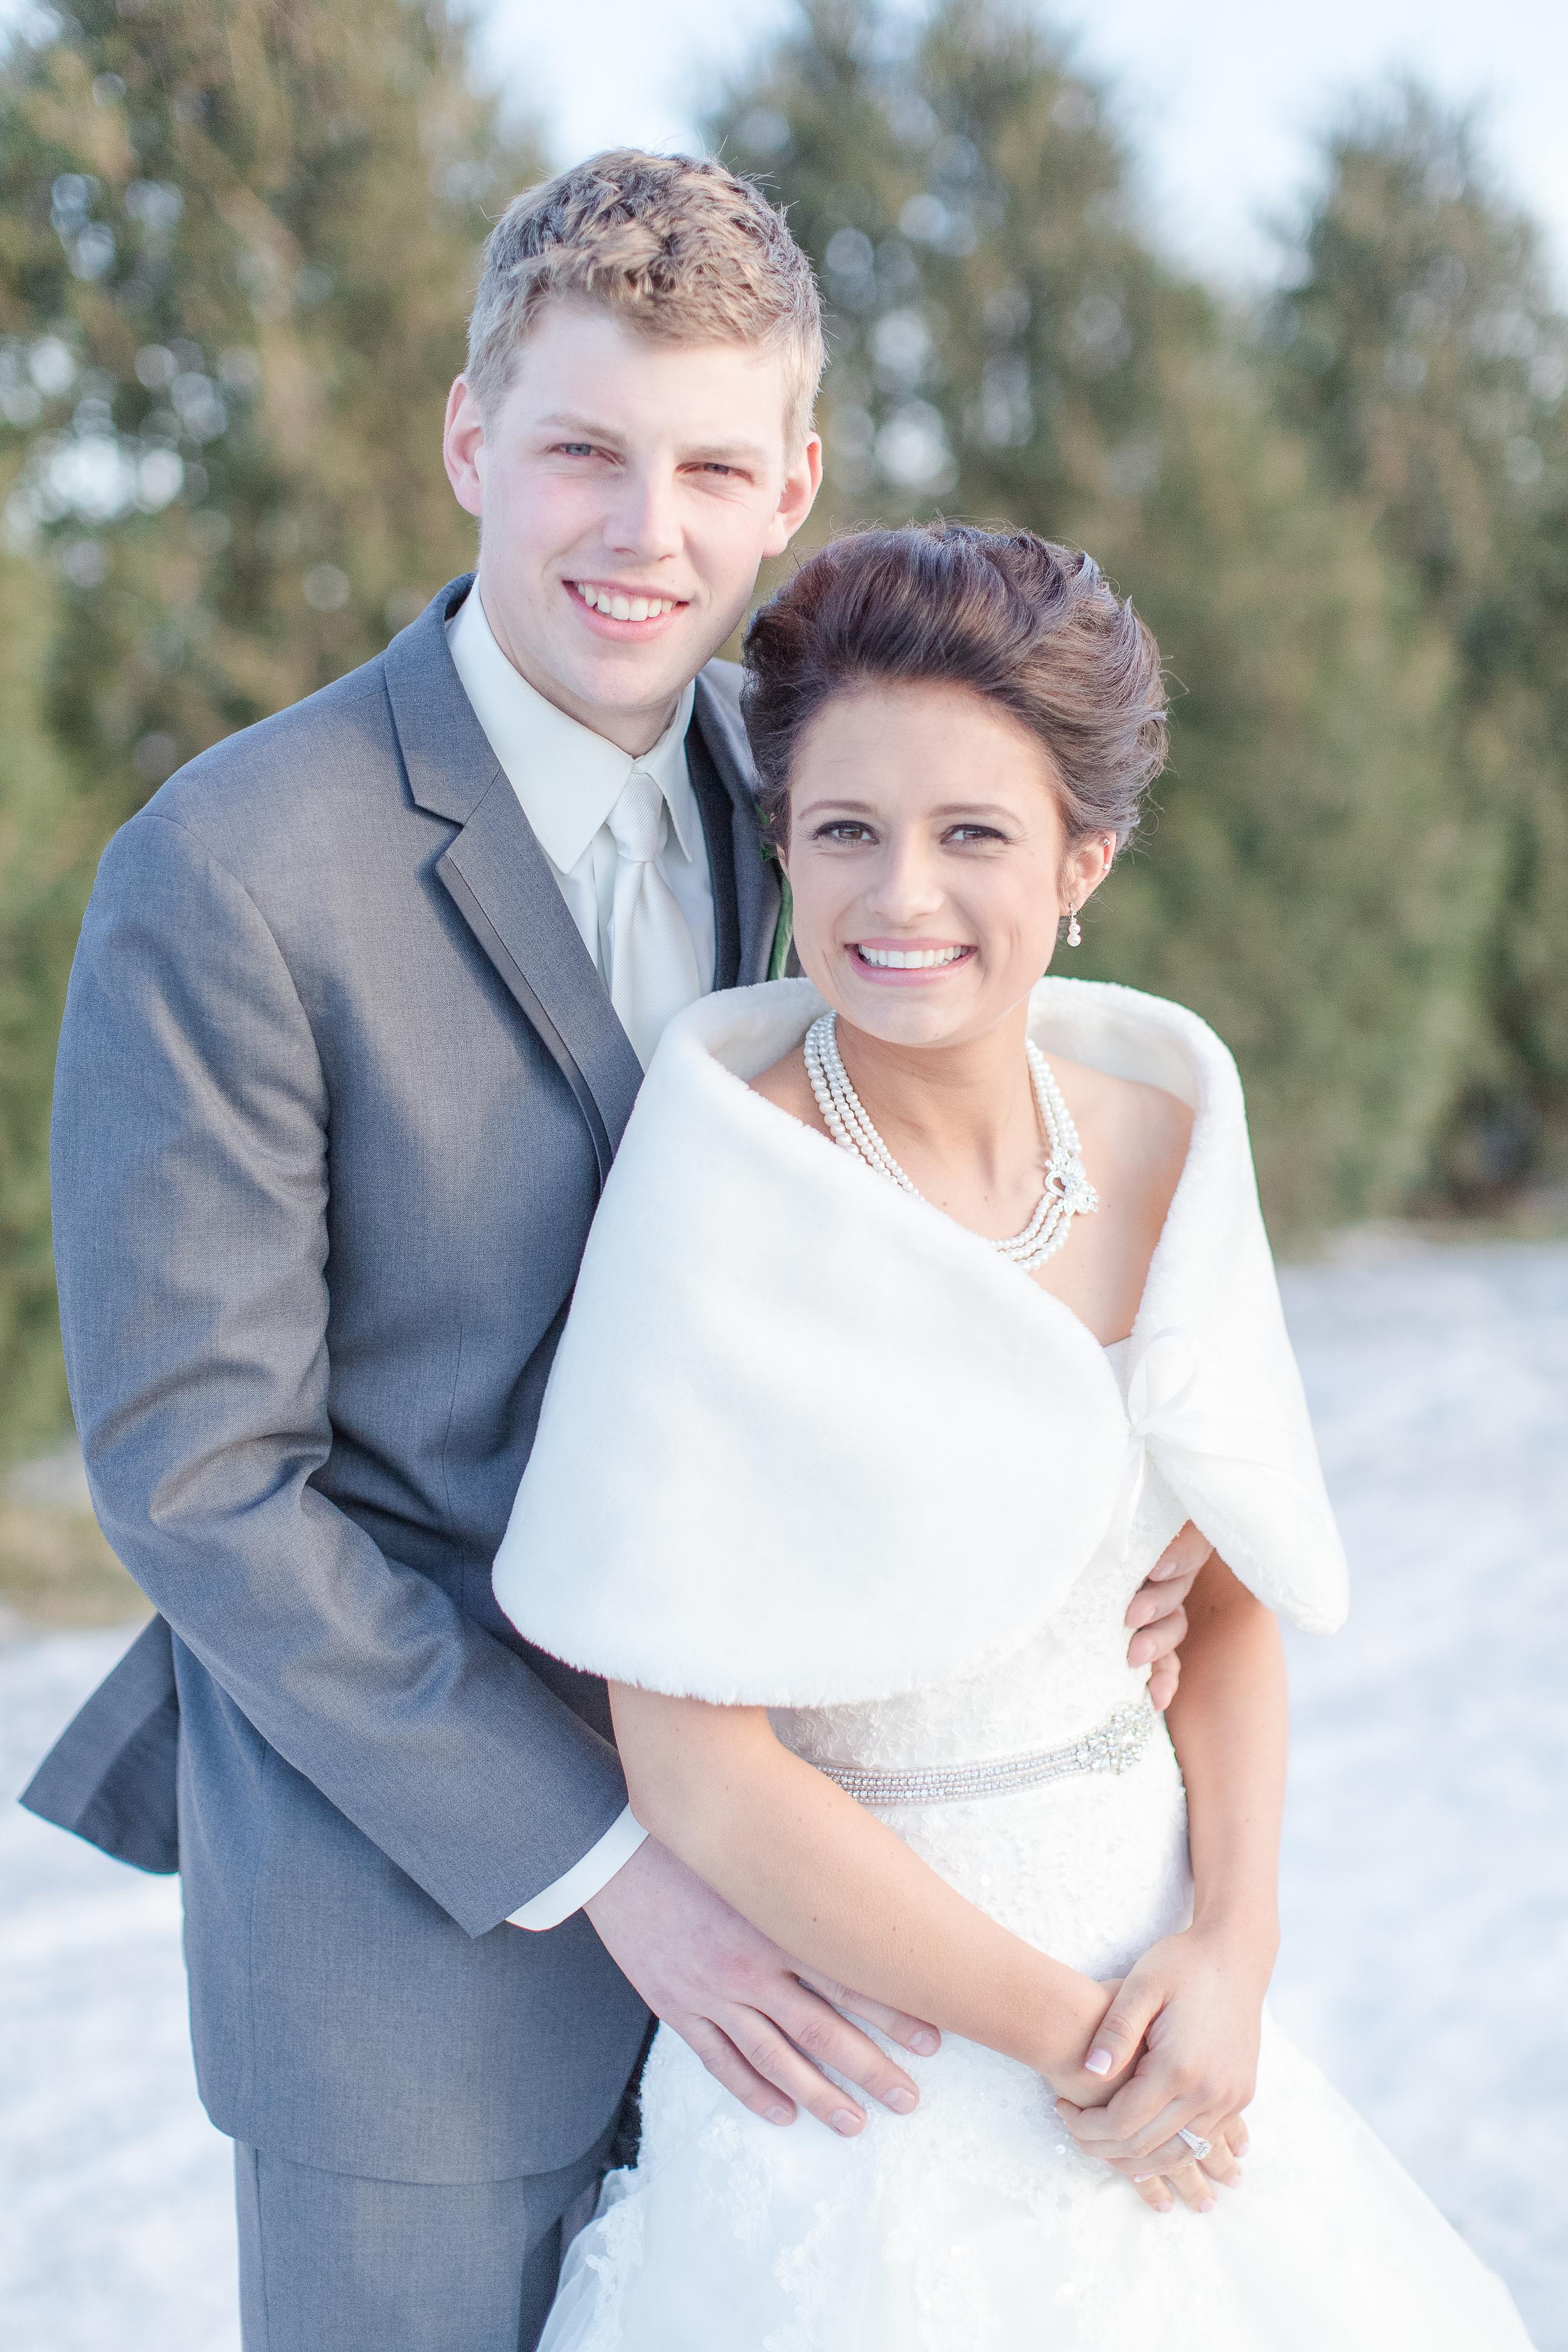 #brideandgroom #mnwedding #winterwedding #mnwedding